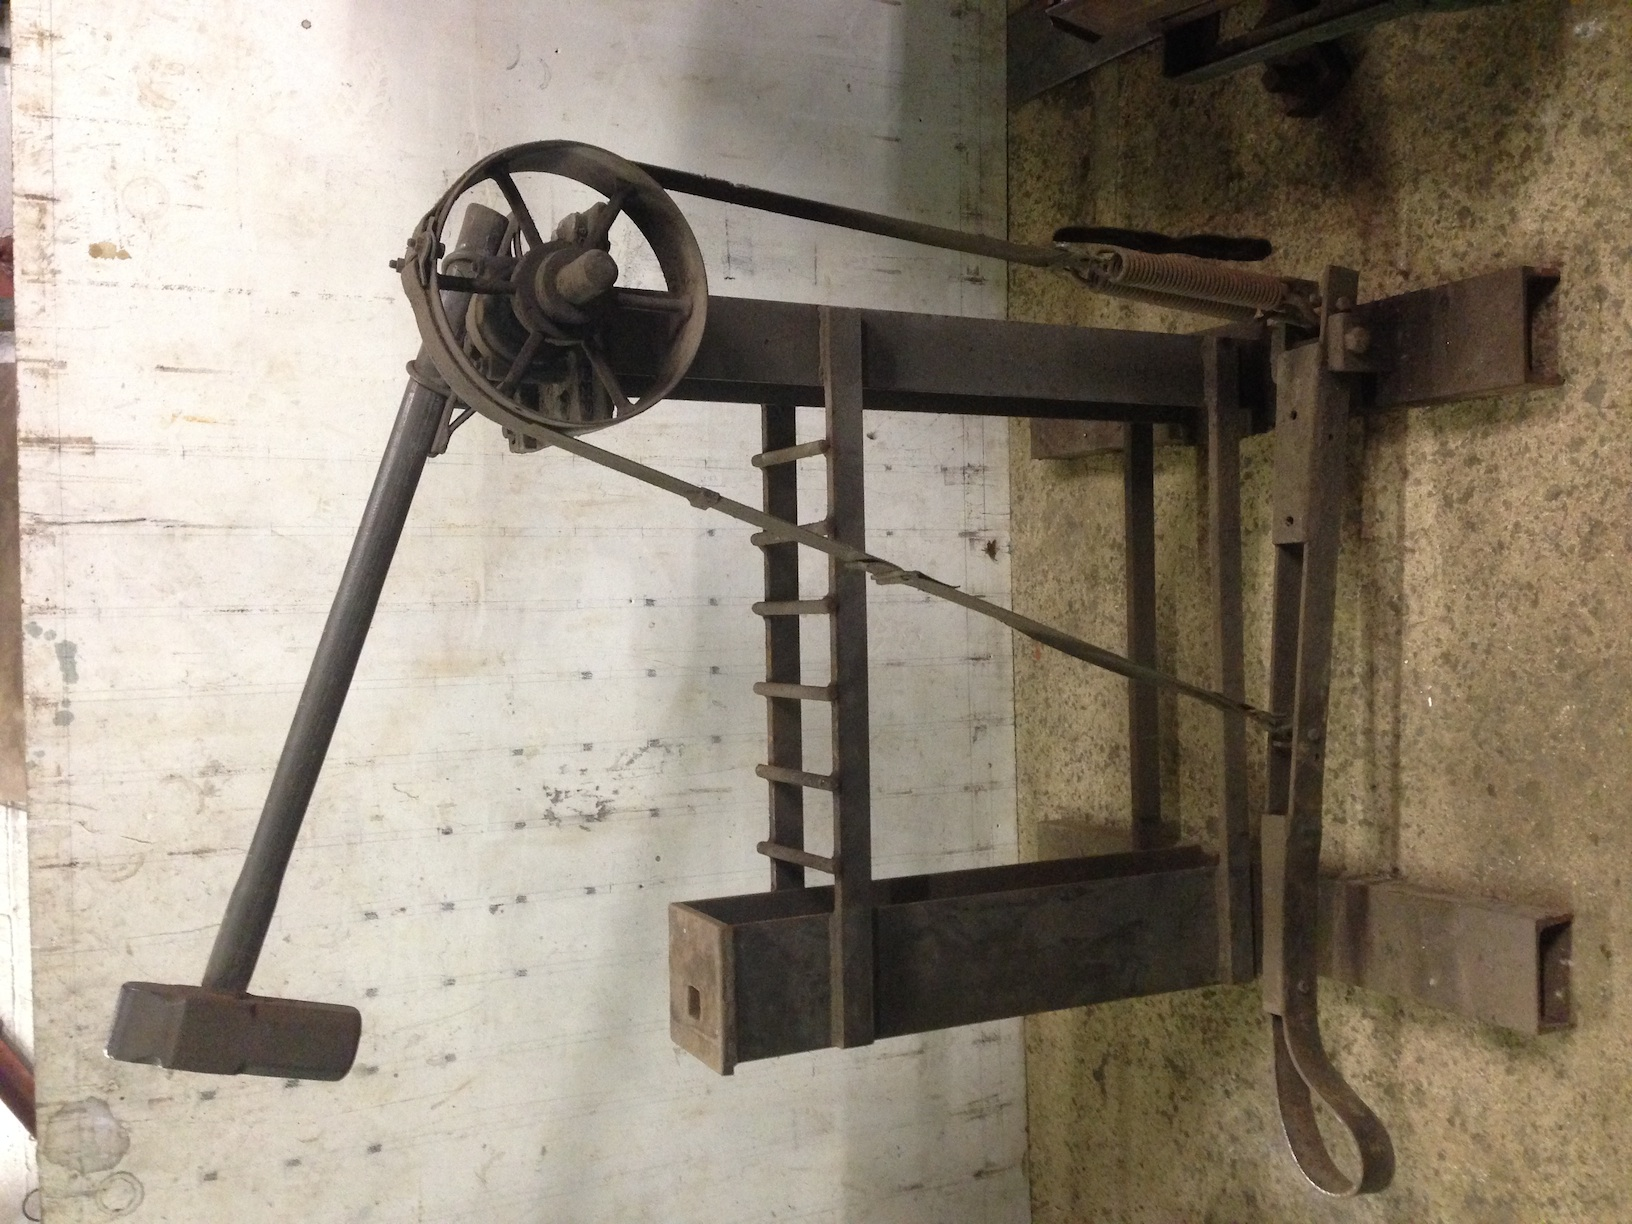 Treadle hammer mechanics? - Power Hammers, Treadle Hammers ...